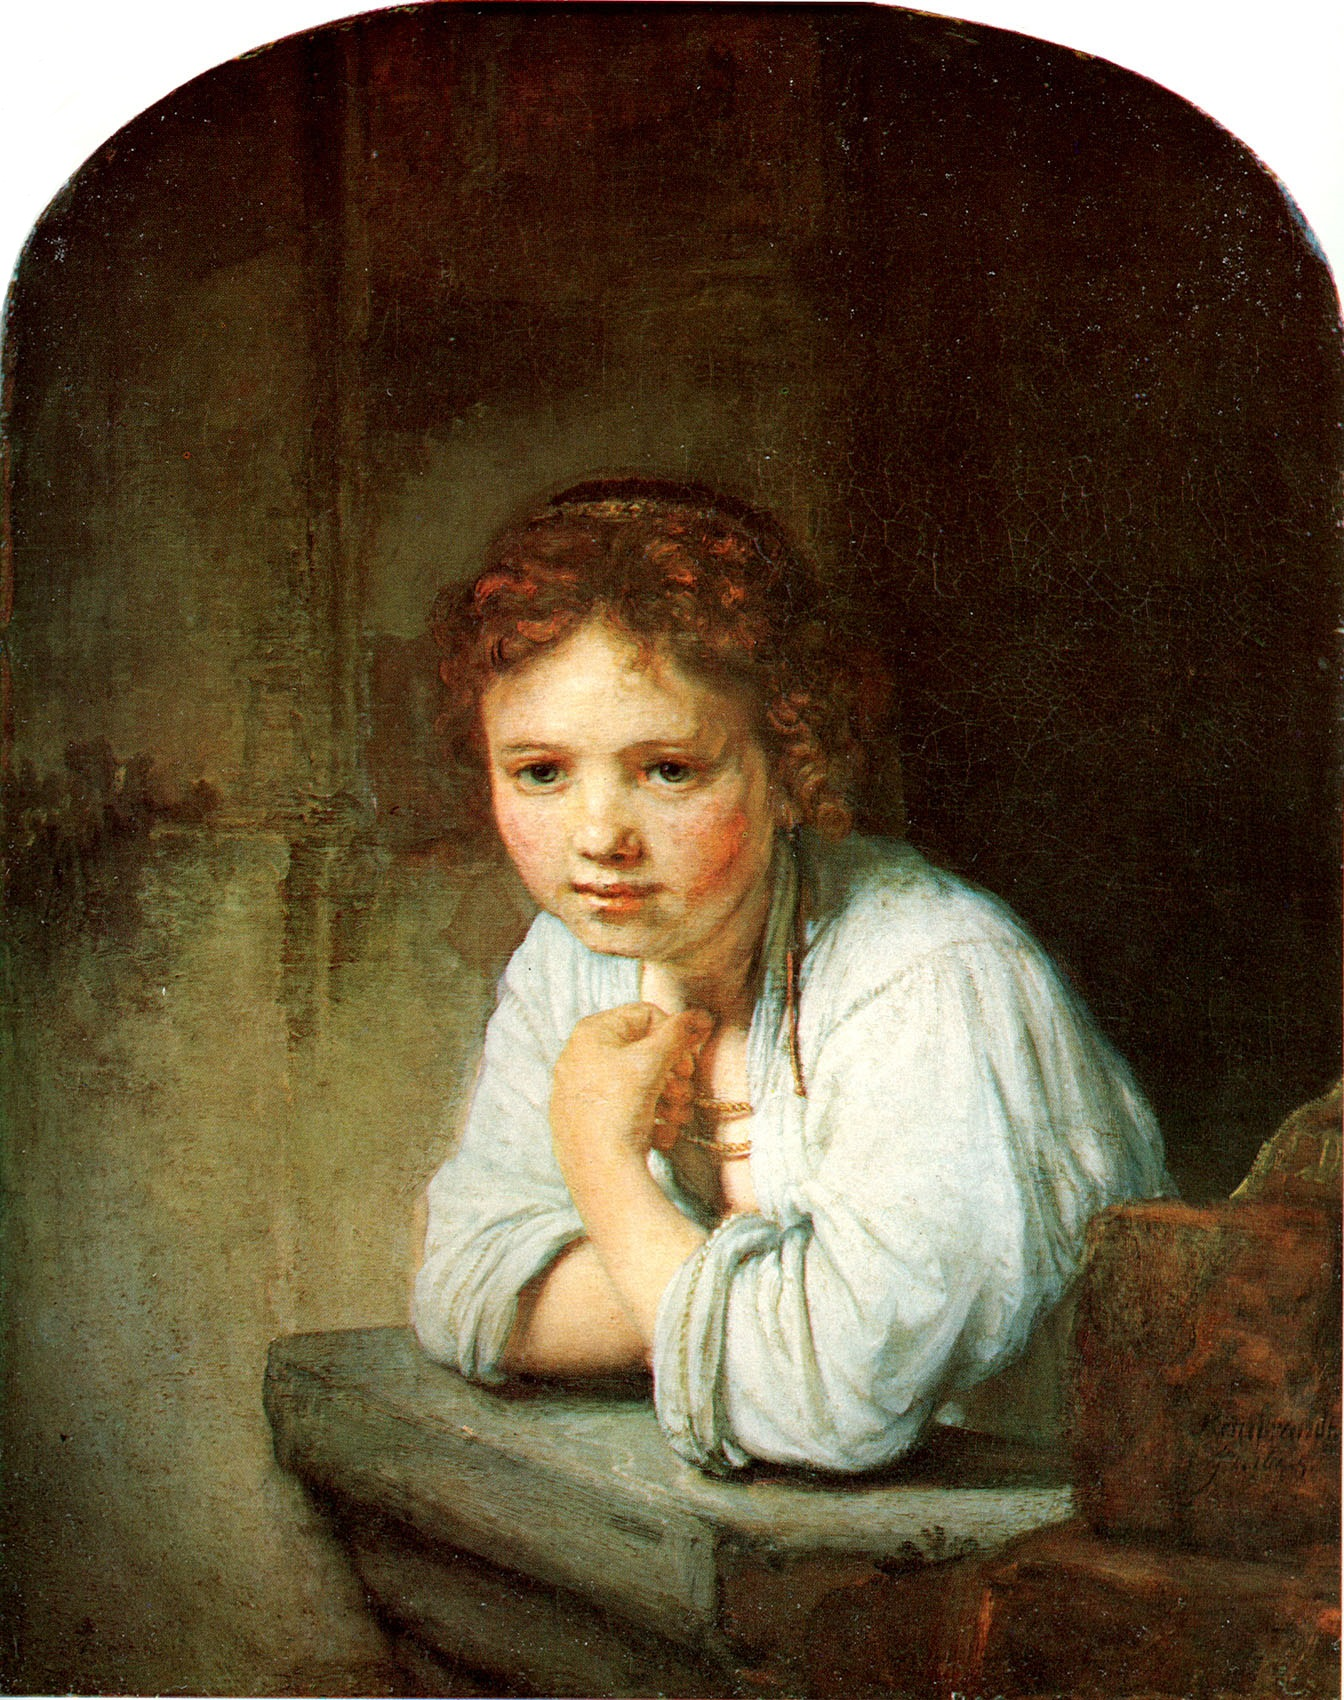 Рембрандт ван Рейн. Девушка у окна. 1645.